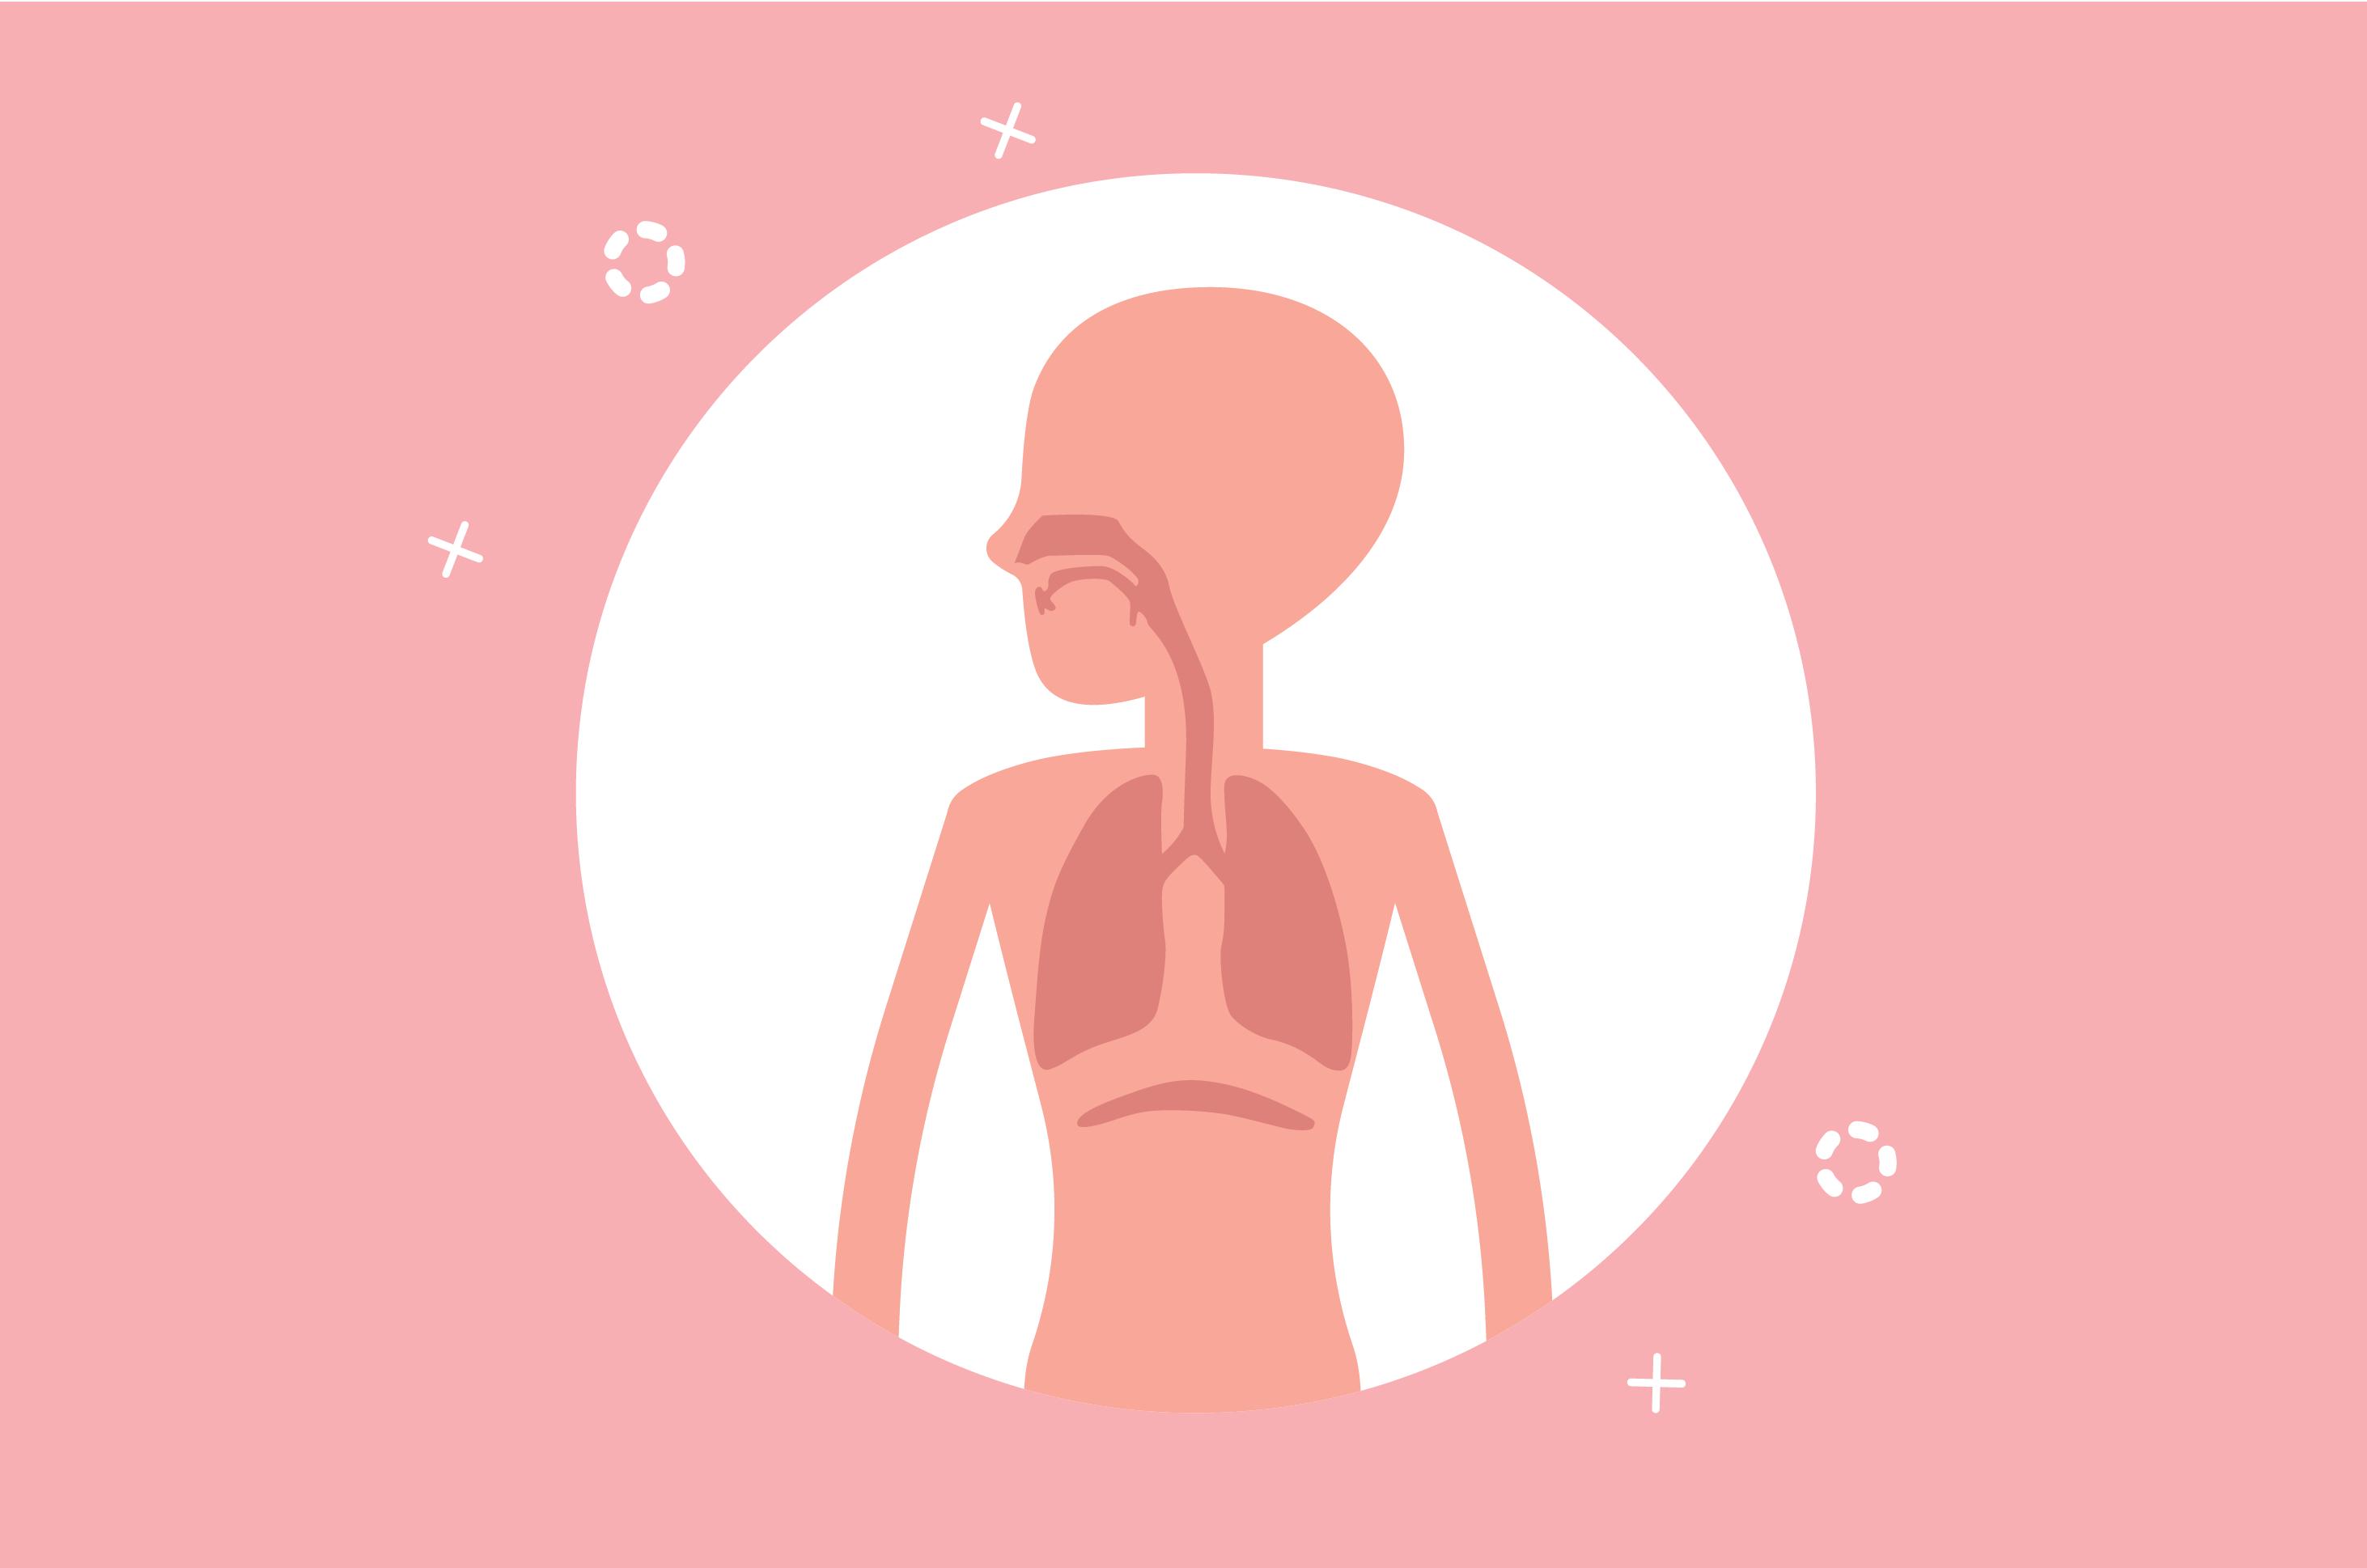 Komplikasi Sakit Pernapasan Bisa Sebabkan Efusi Pleura